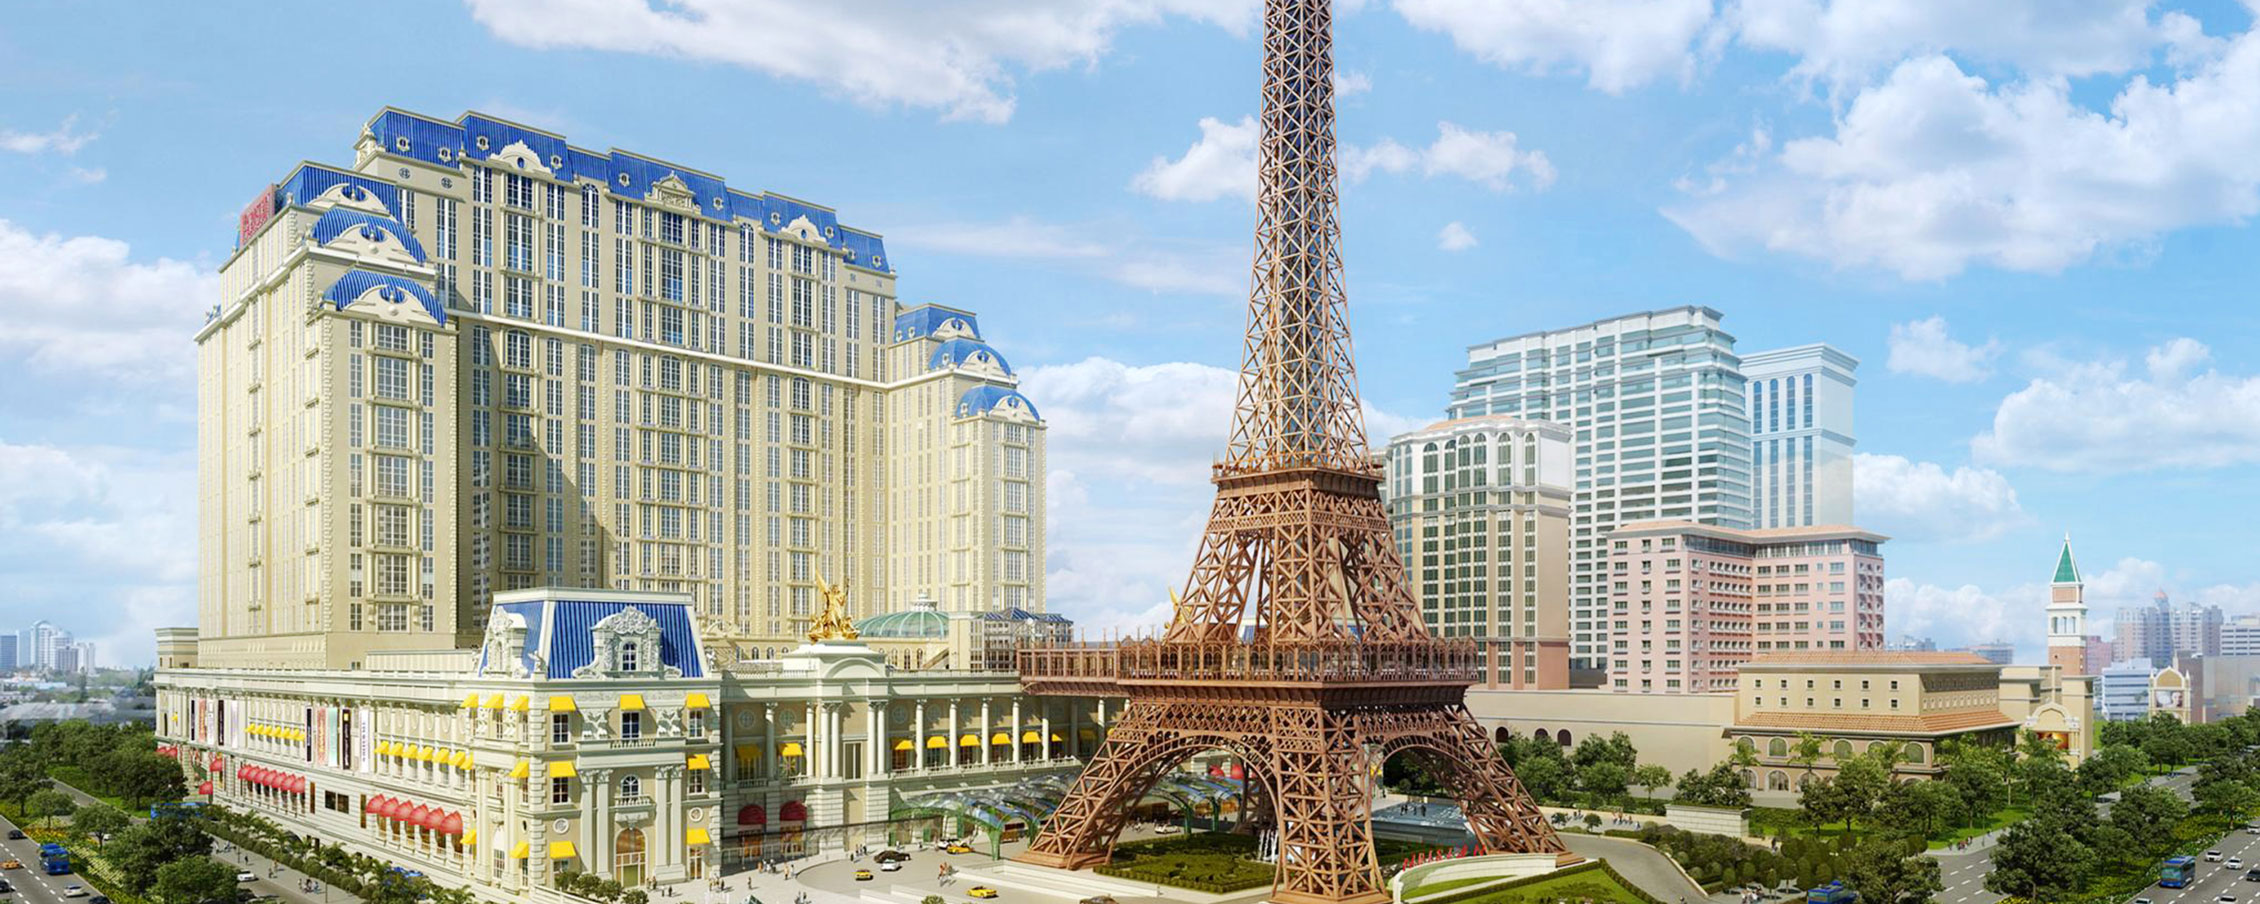 Paris Las Vegas Hotel Meeting Rooms